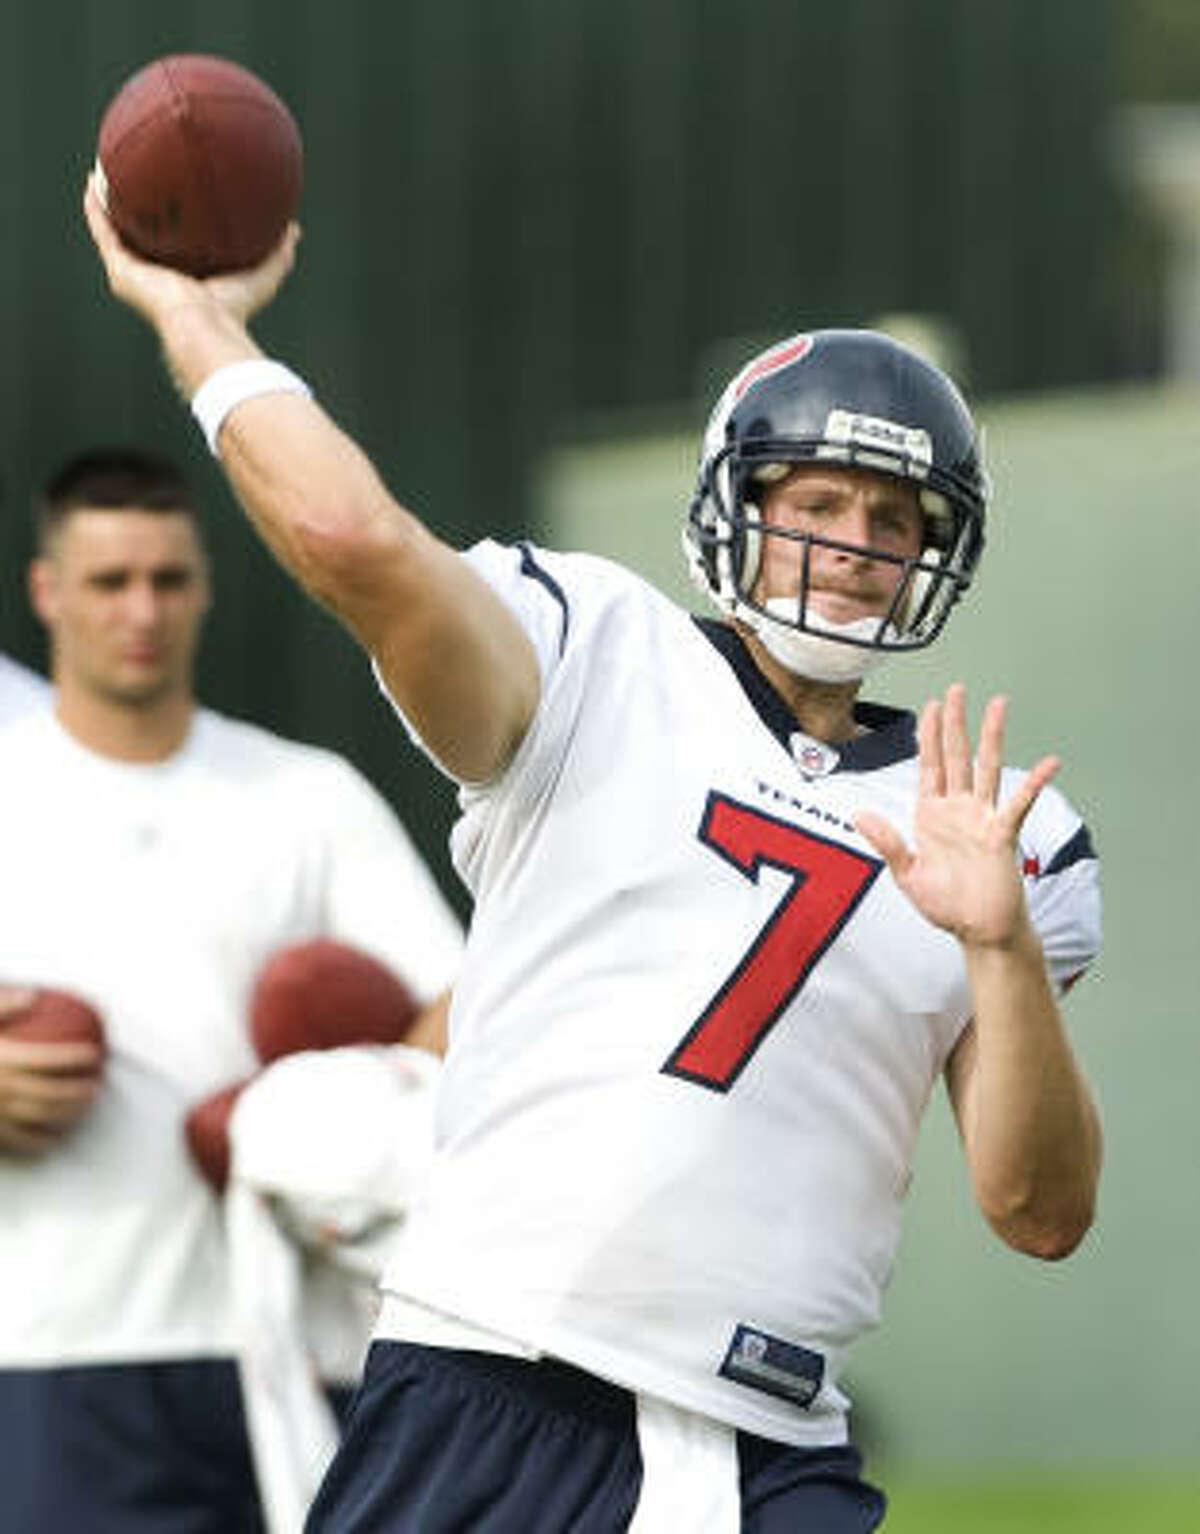 Backup quarterback Dan Orlovsky wears No. 7 to honor Hall of Fame quarterback John Elway. More on Texans numbers.